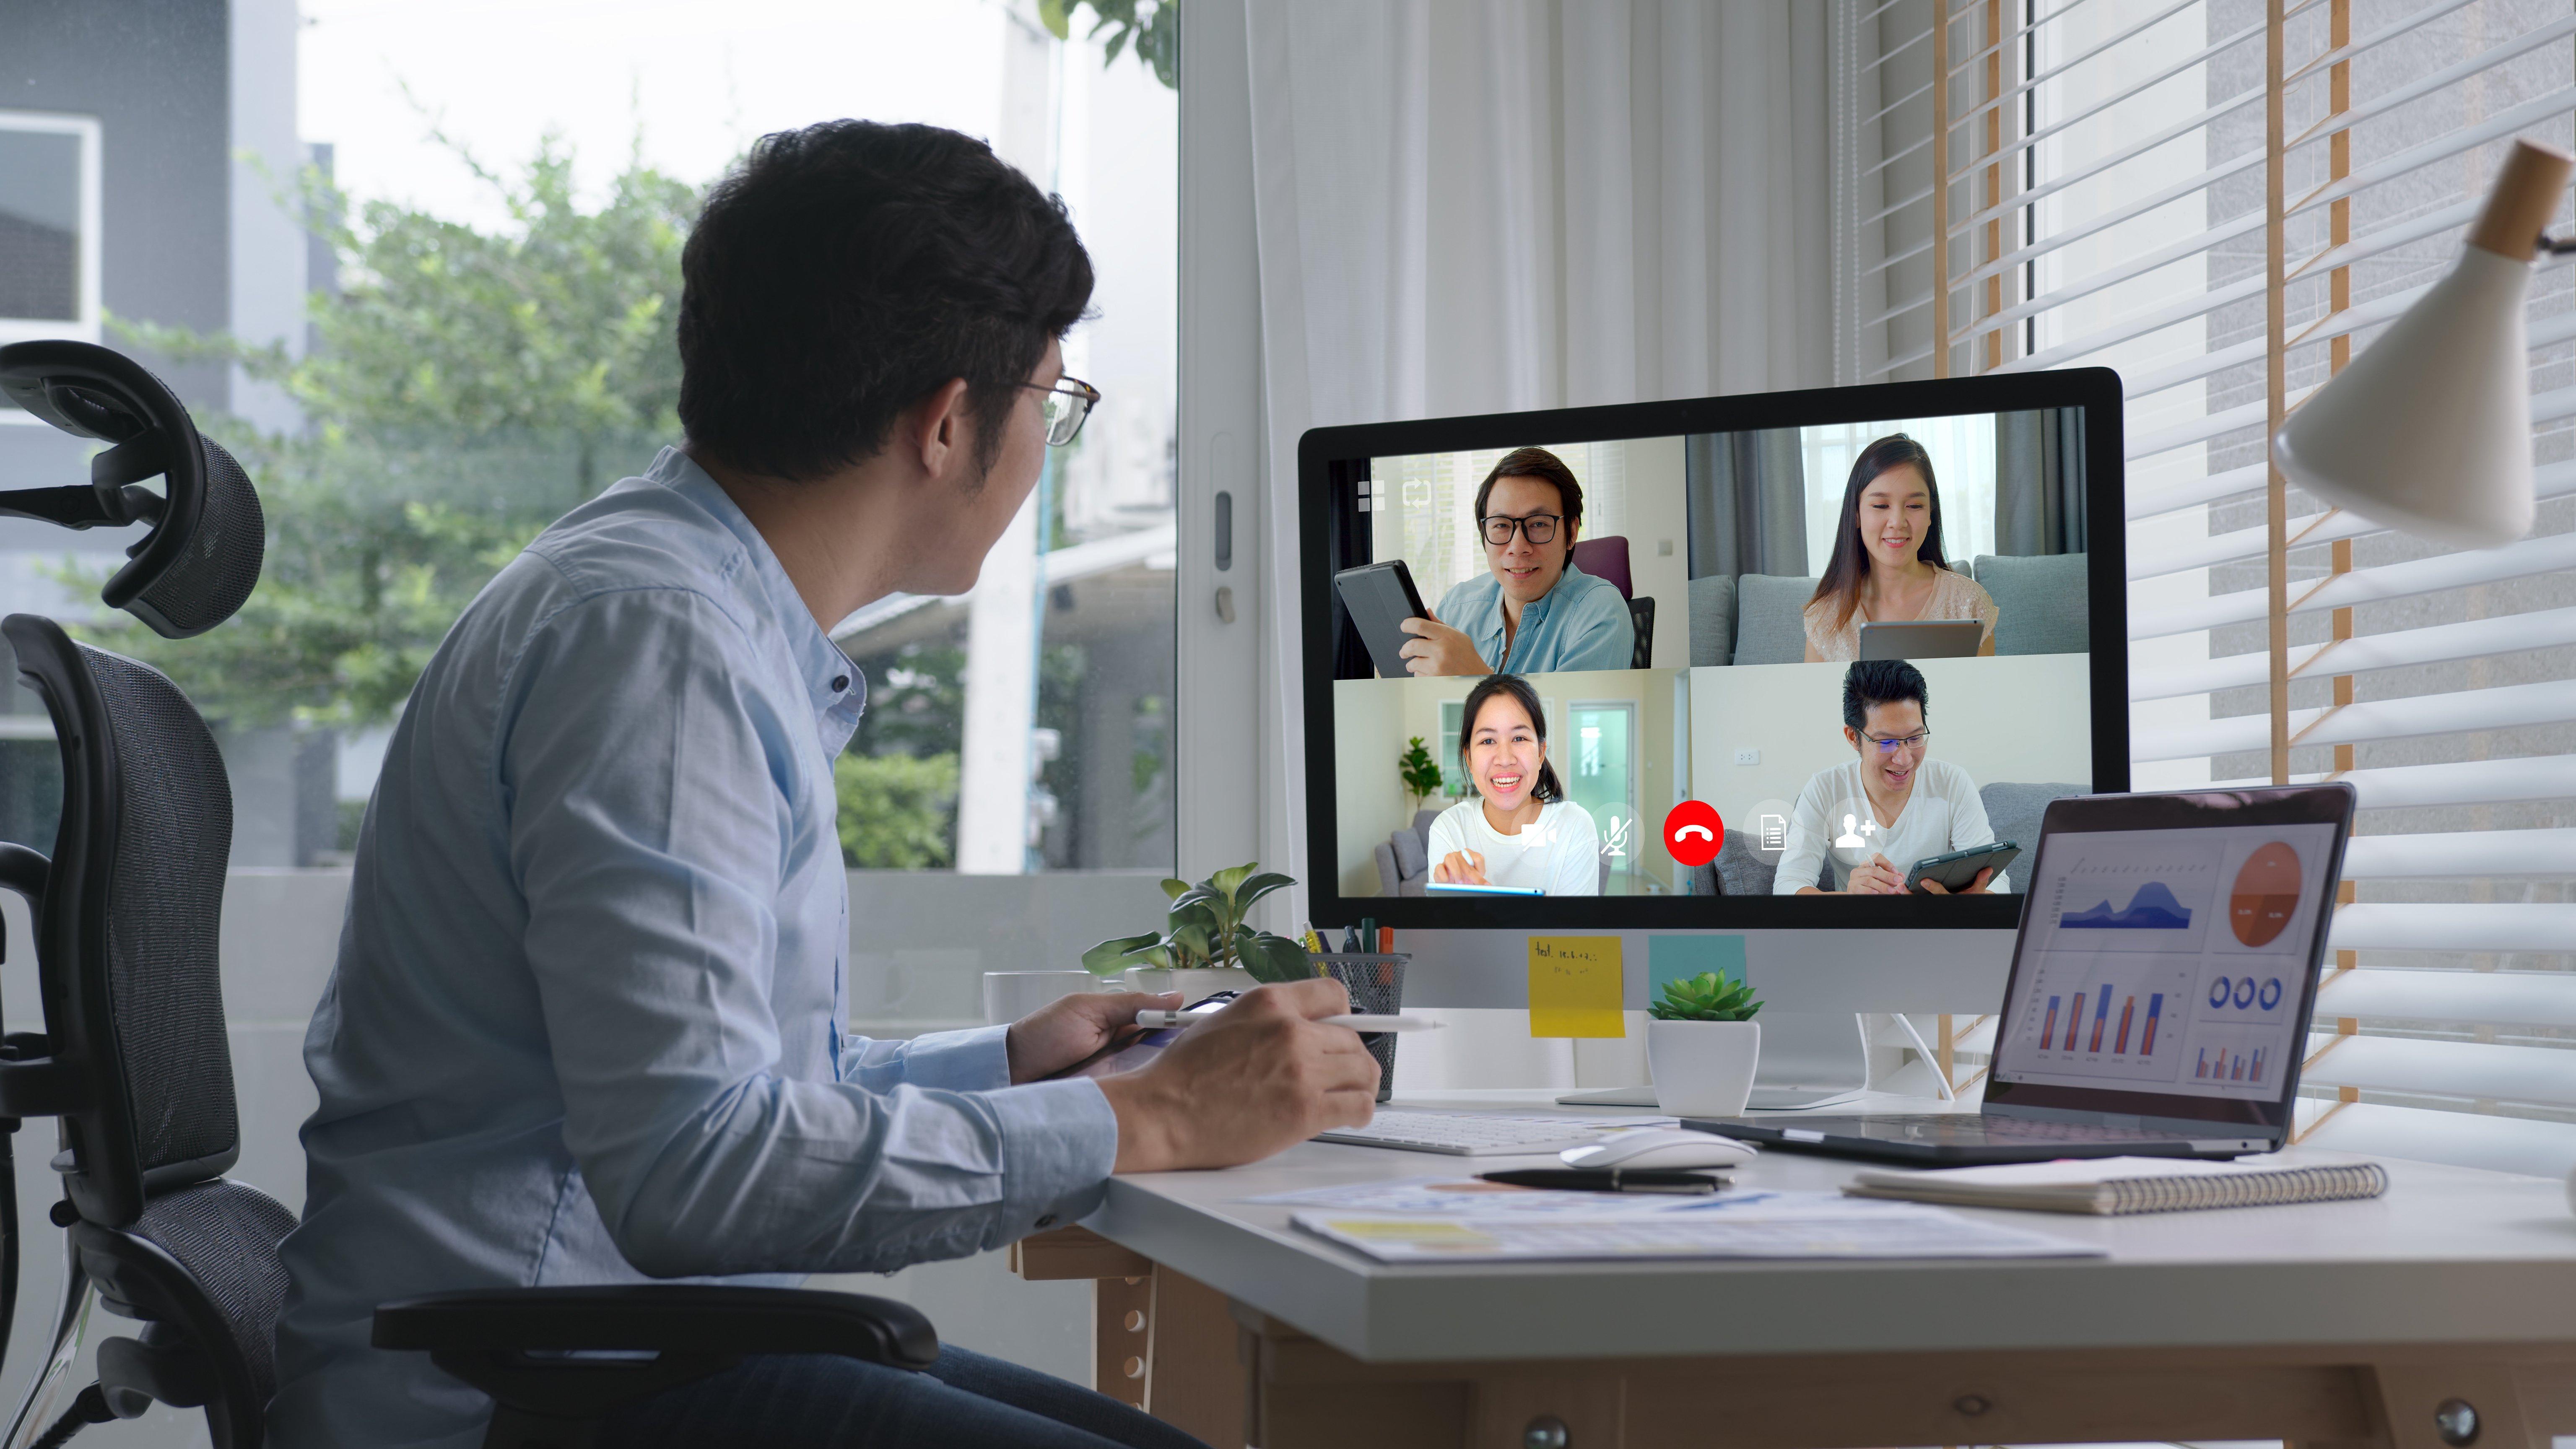 Collaboration technology